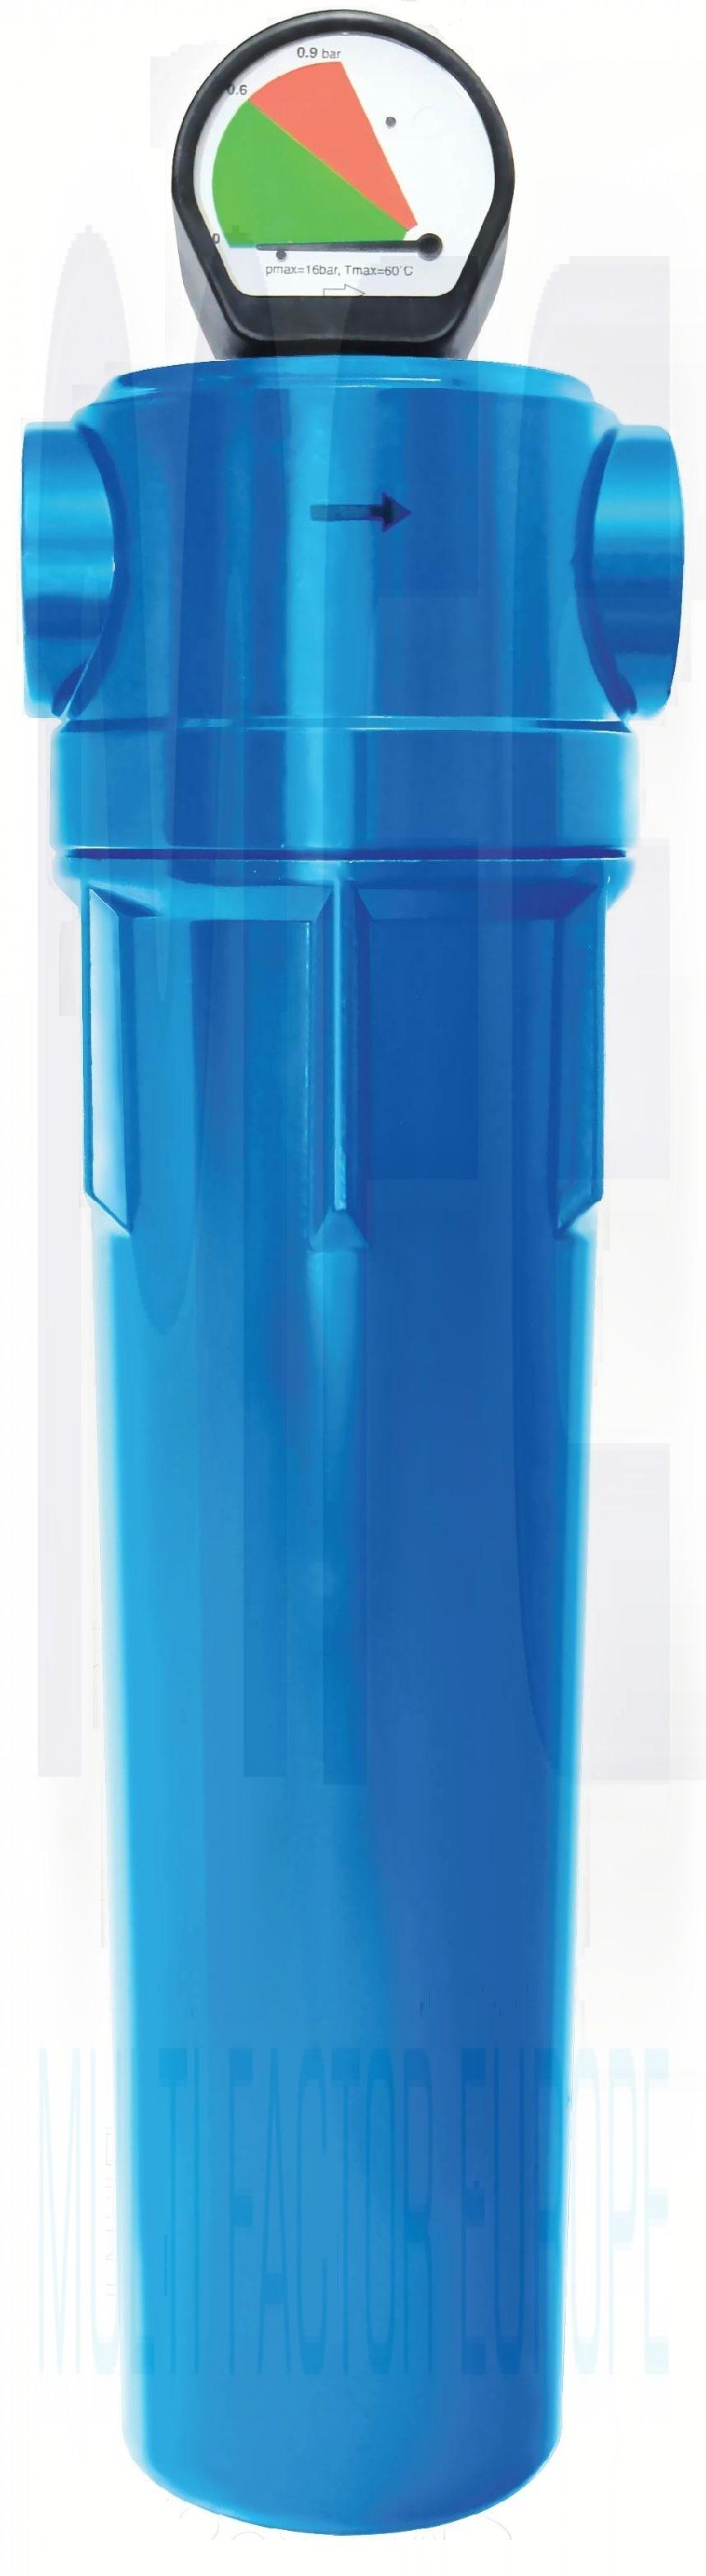 twin air oil filter application pdf